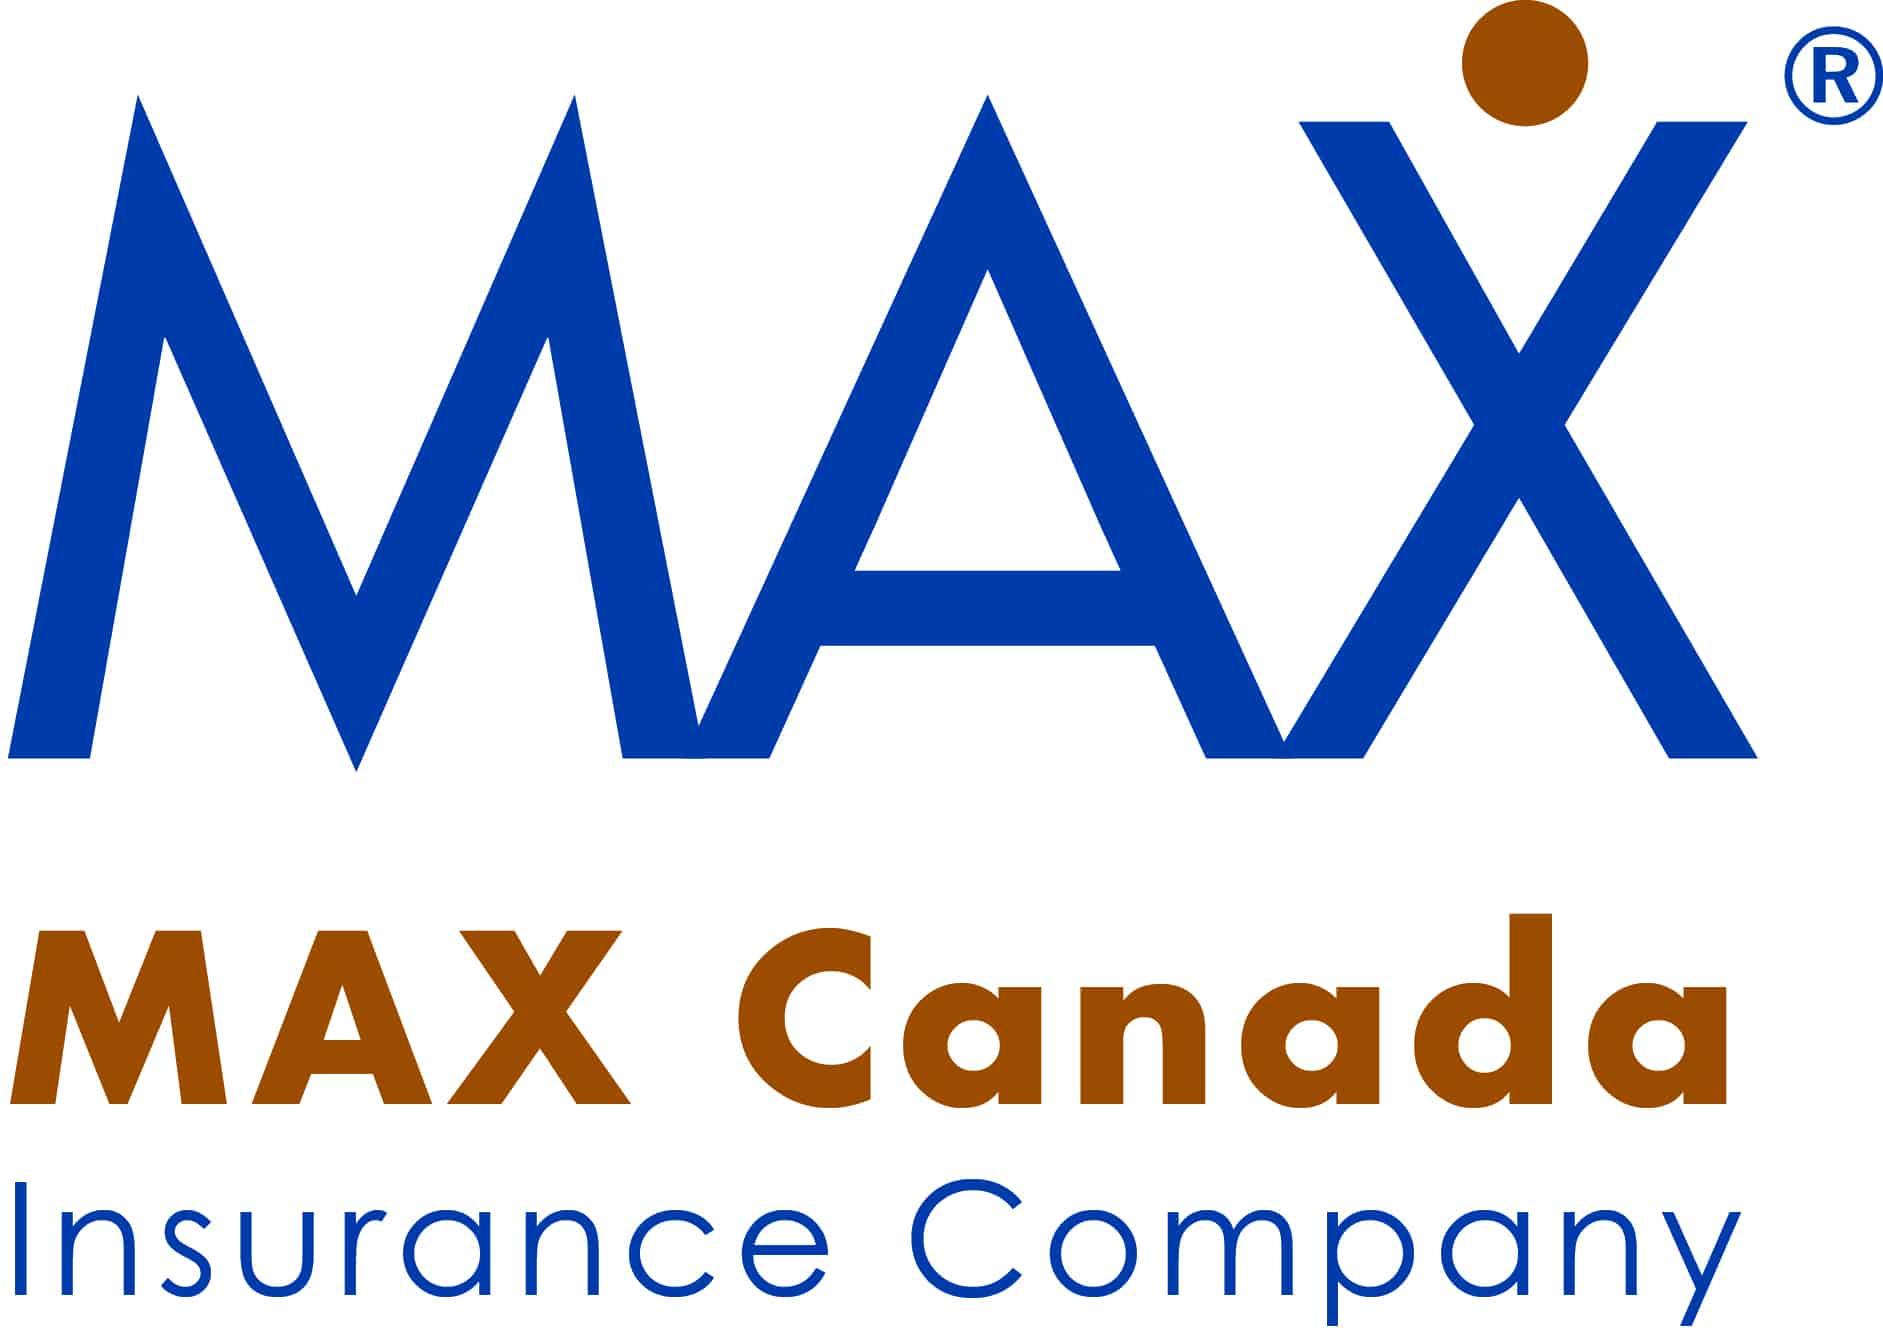 Max Canada Insurance Company